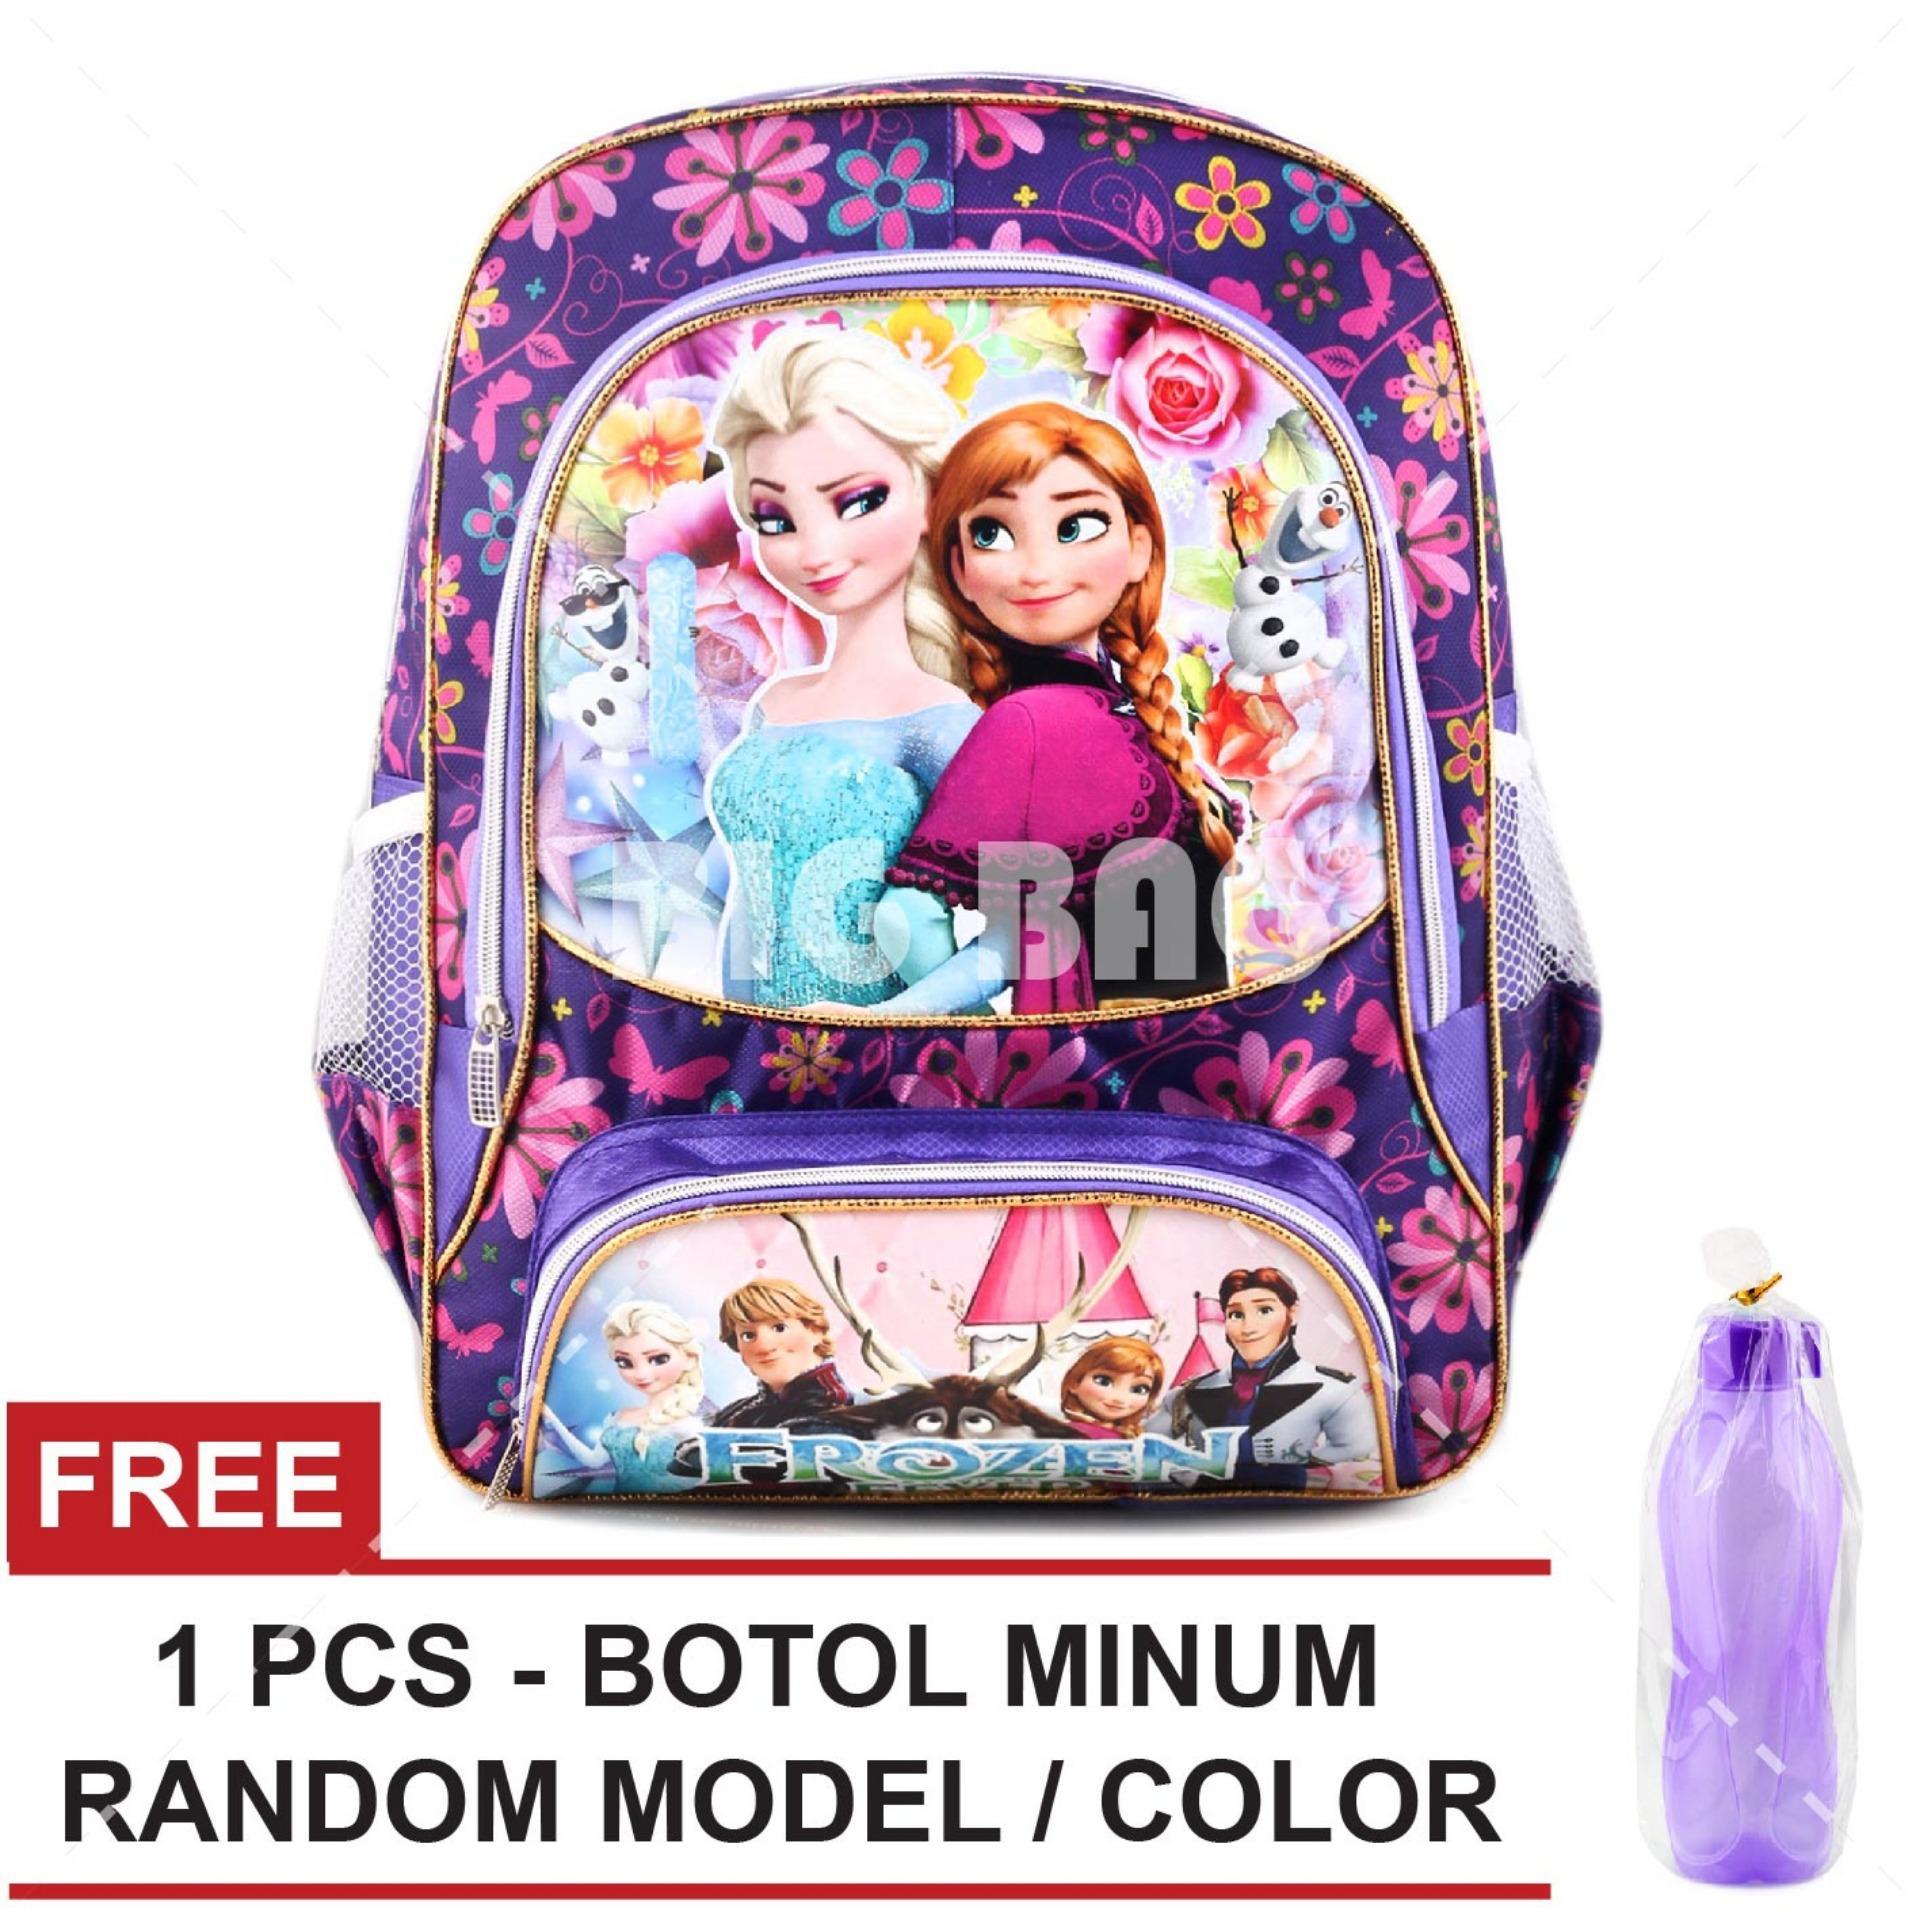 Tas Ransel Anak - Frozen Anna Elsa - True Love - School Bag Tas Sekolah Anak - PURPLE + FREE Botol Minum  Random Color / Model Tas Anak Tas Sekolah Tas Anak Karakter